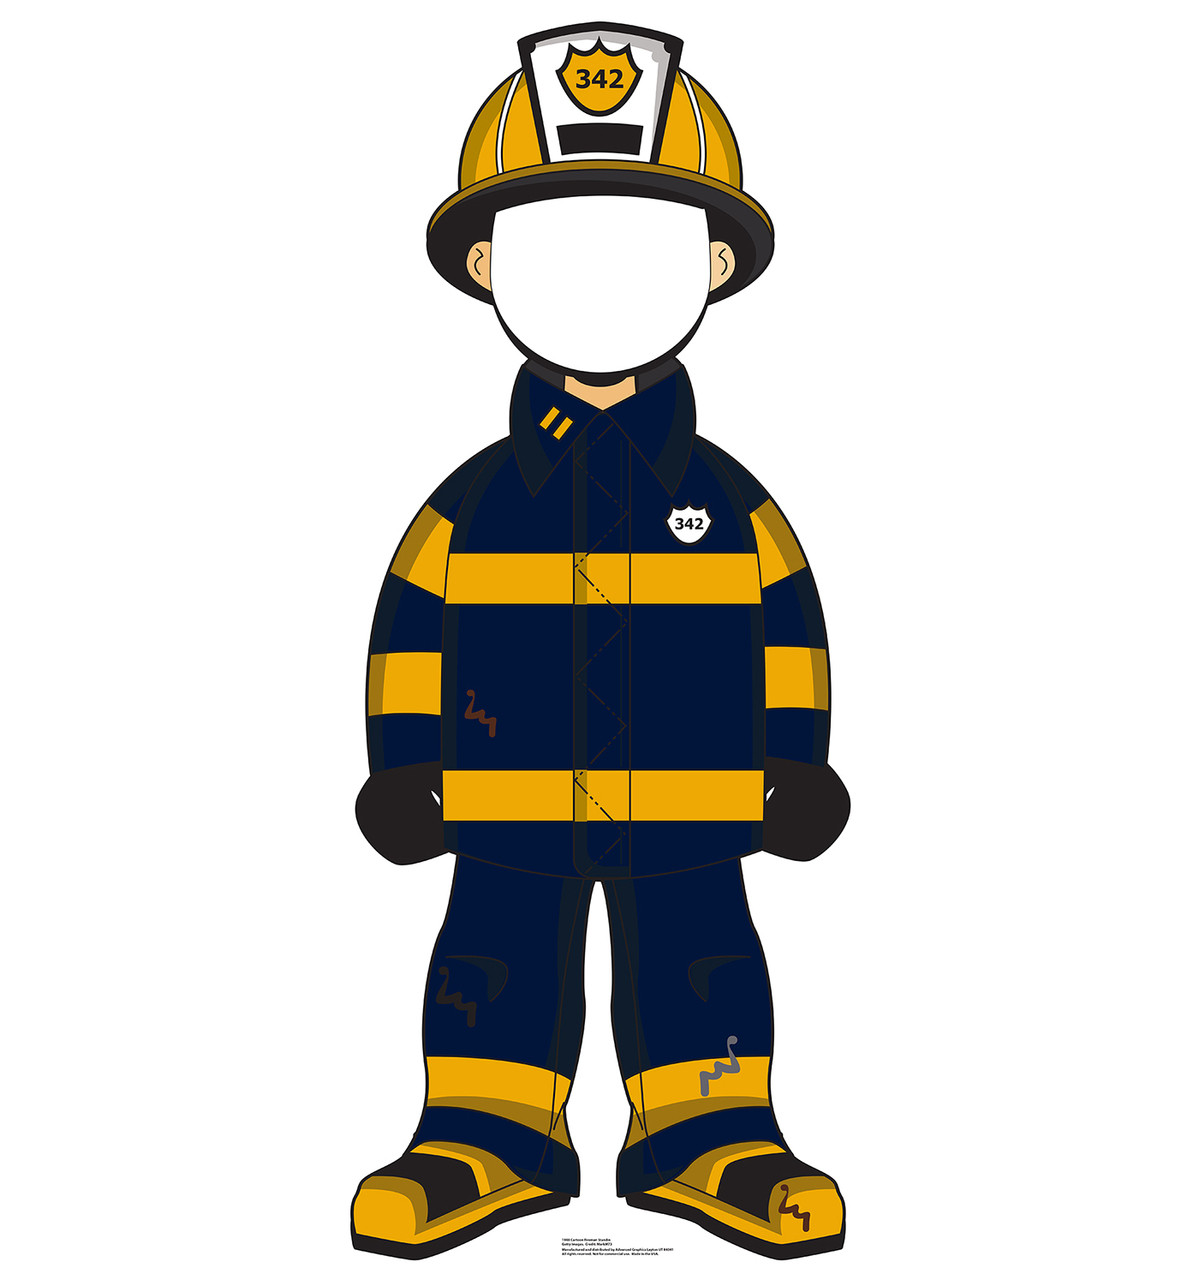 Life-size Cartoon Fireman Standin Cardboard Standup